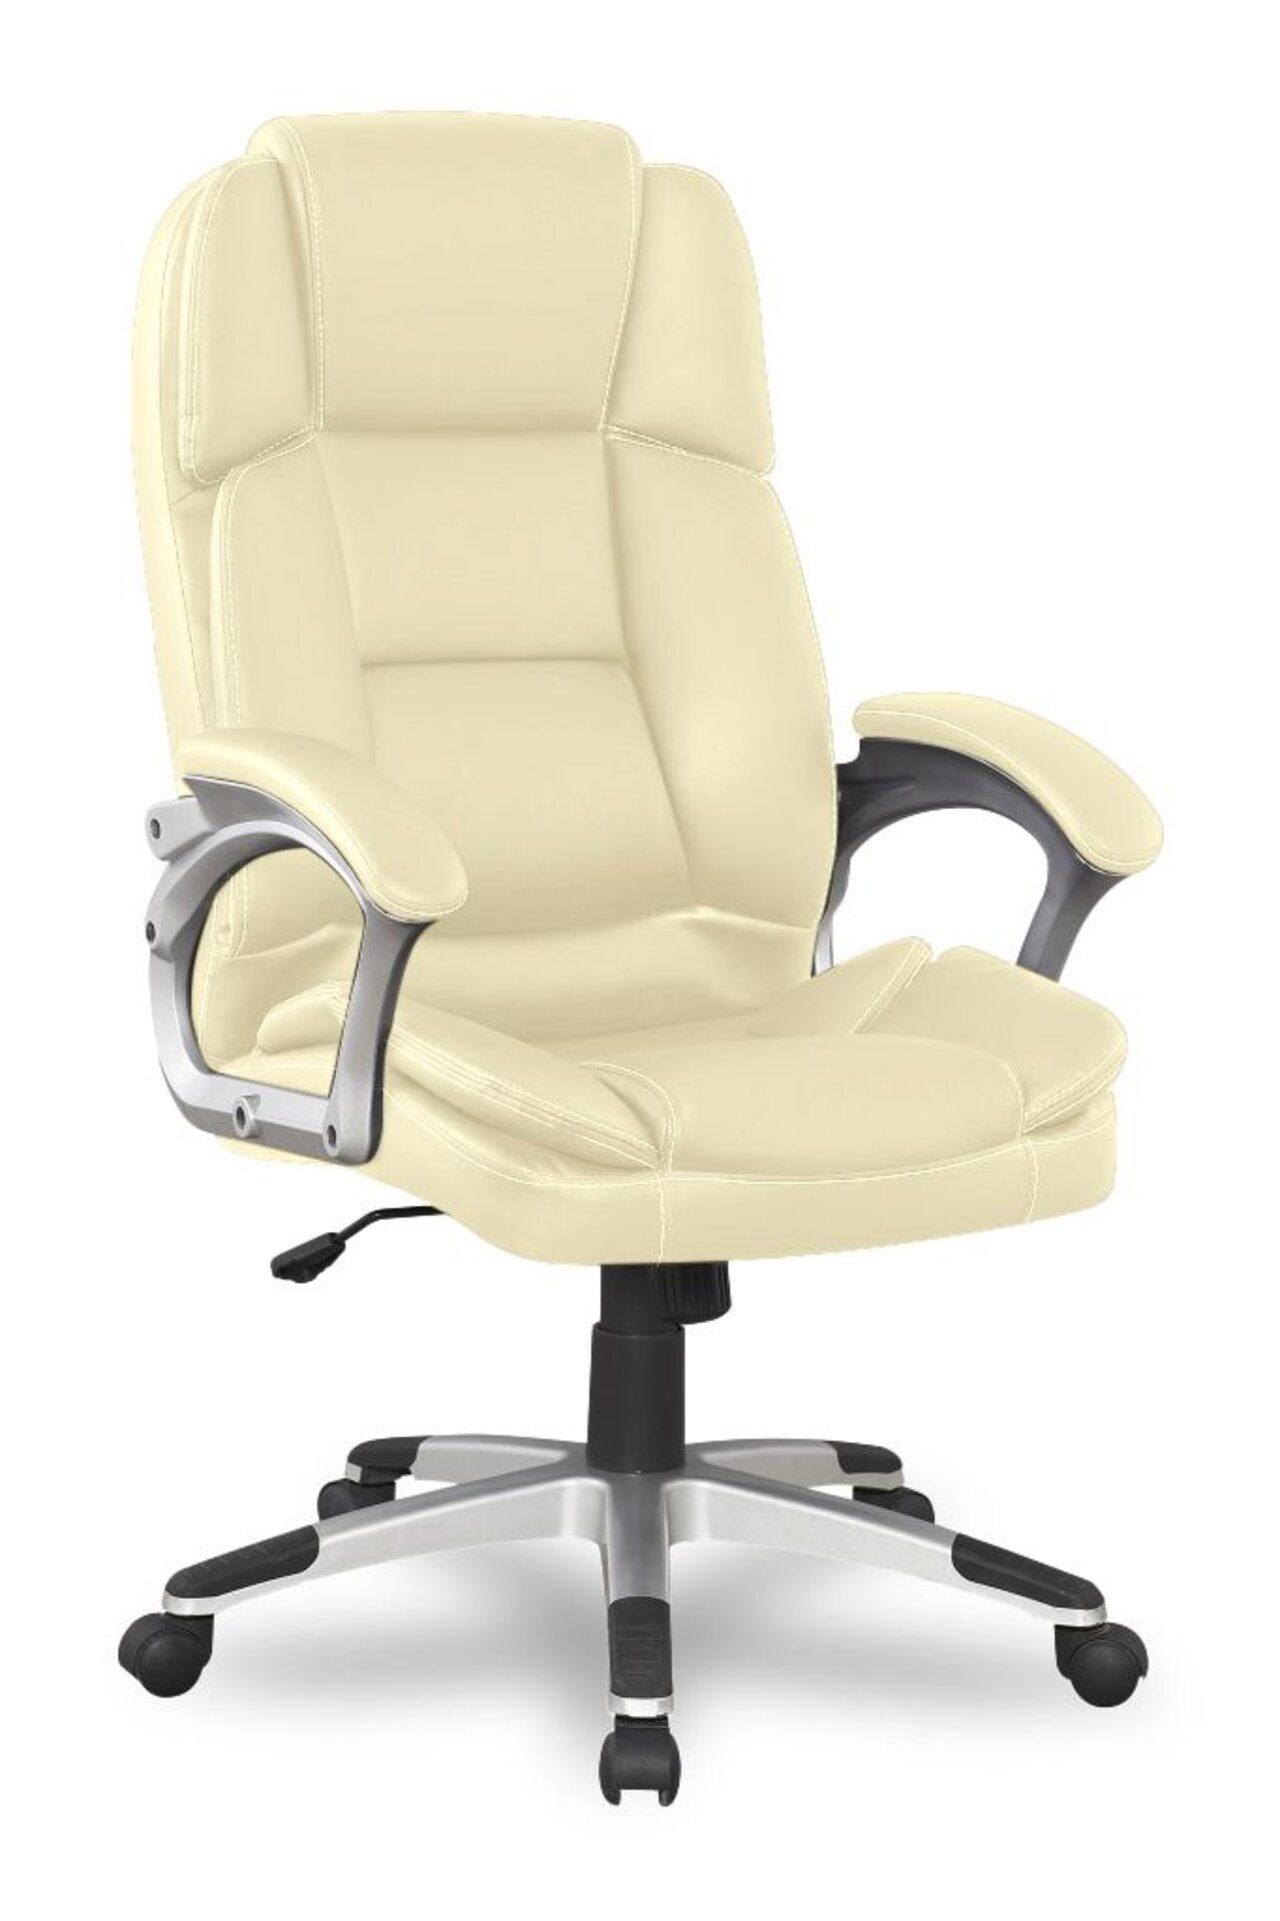 Кресло руководителя College BX-3323 - фото 1